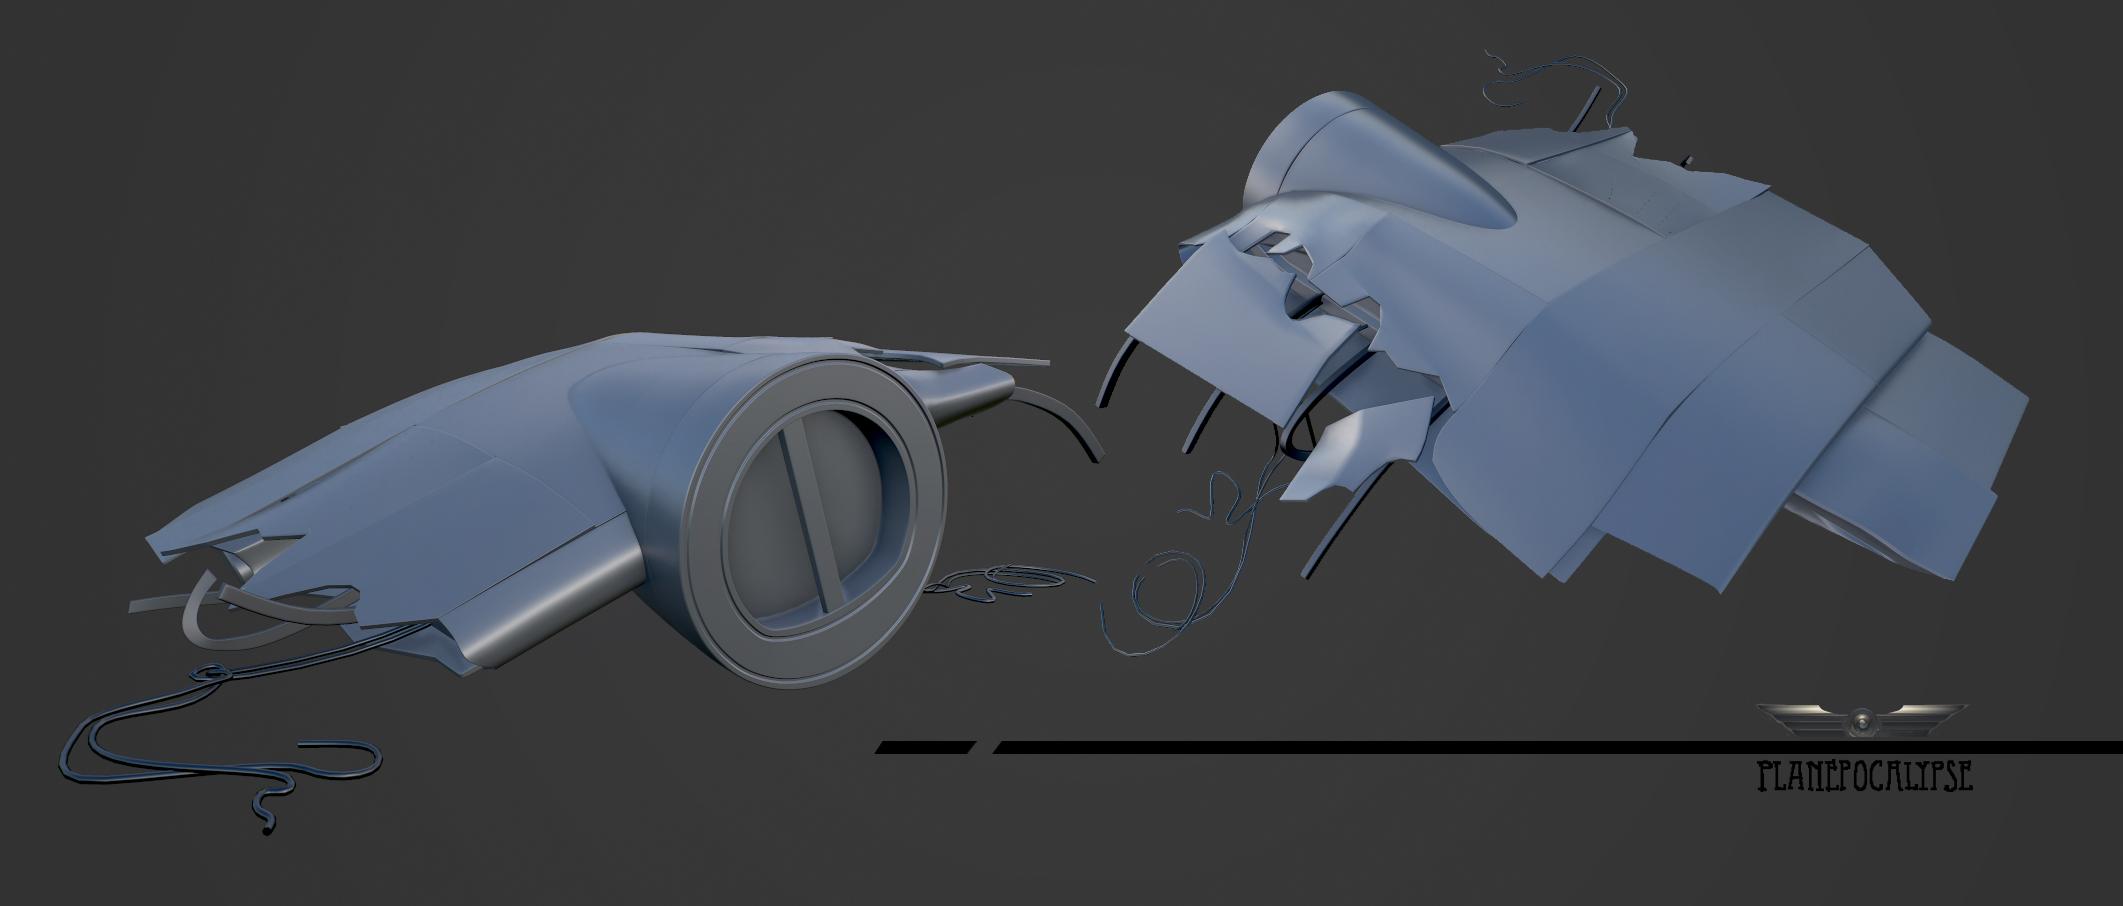 WingFragment.jpg